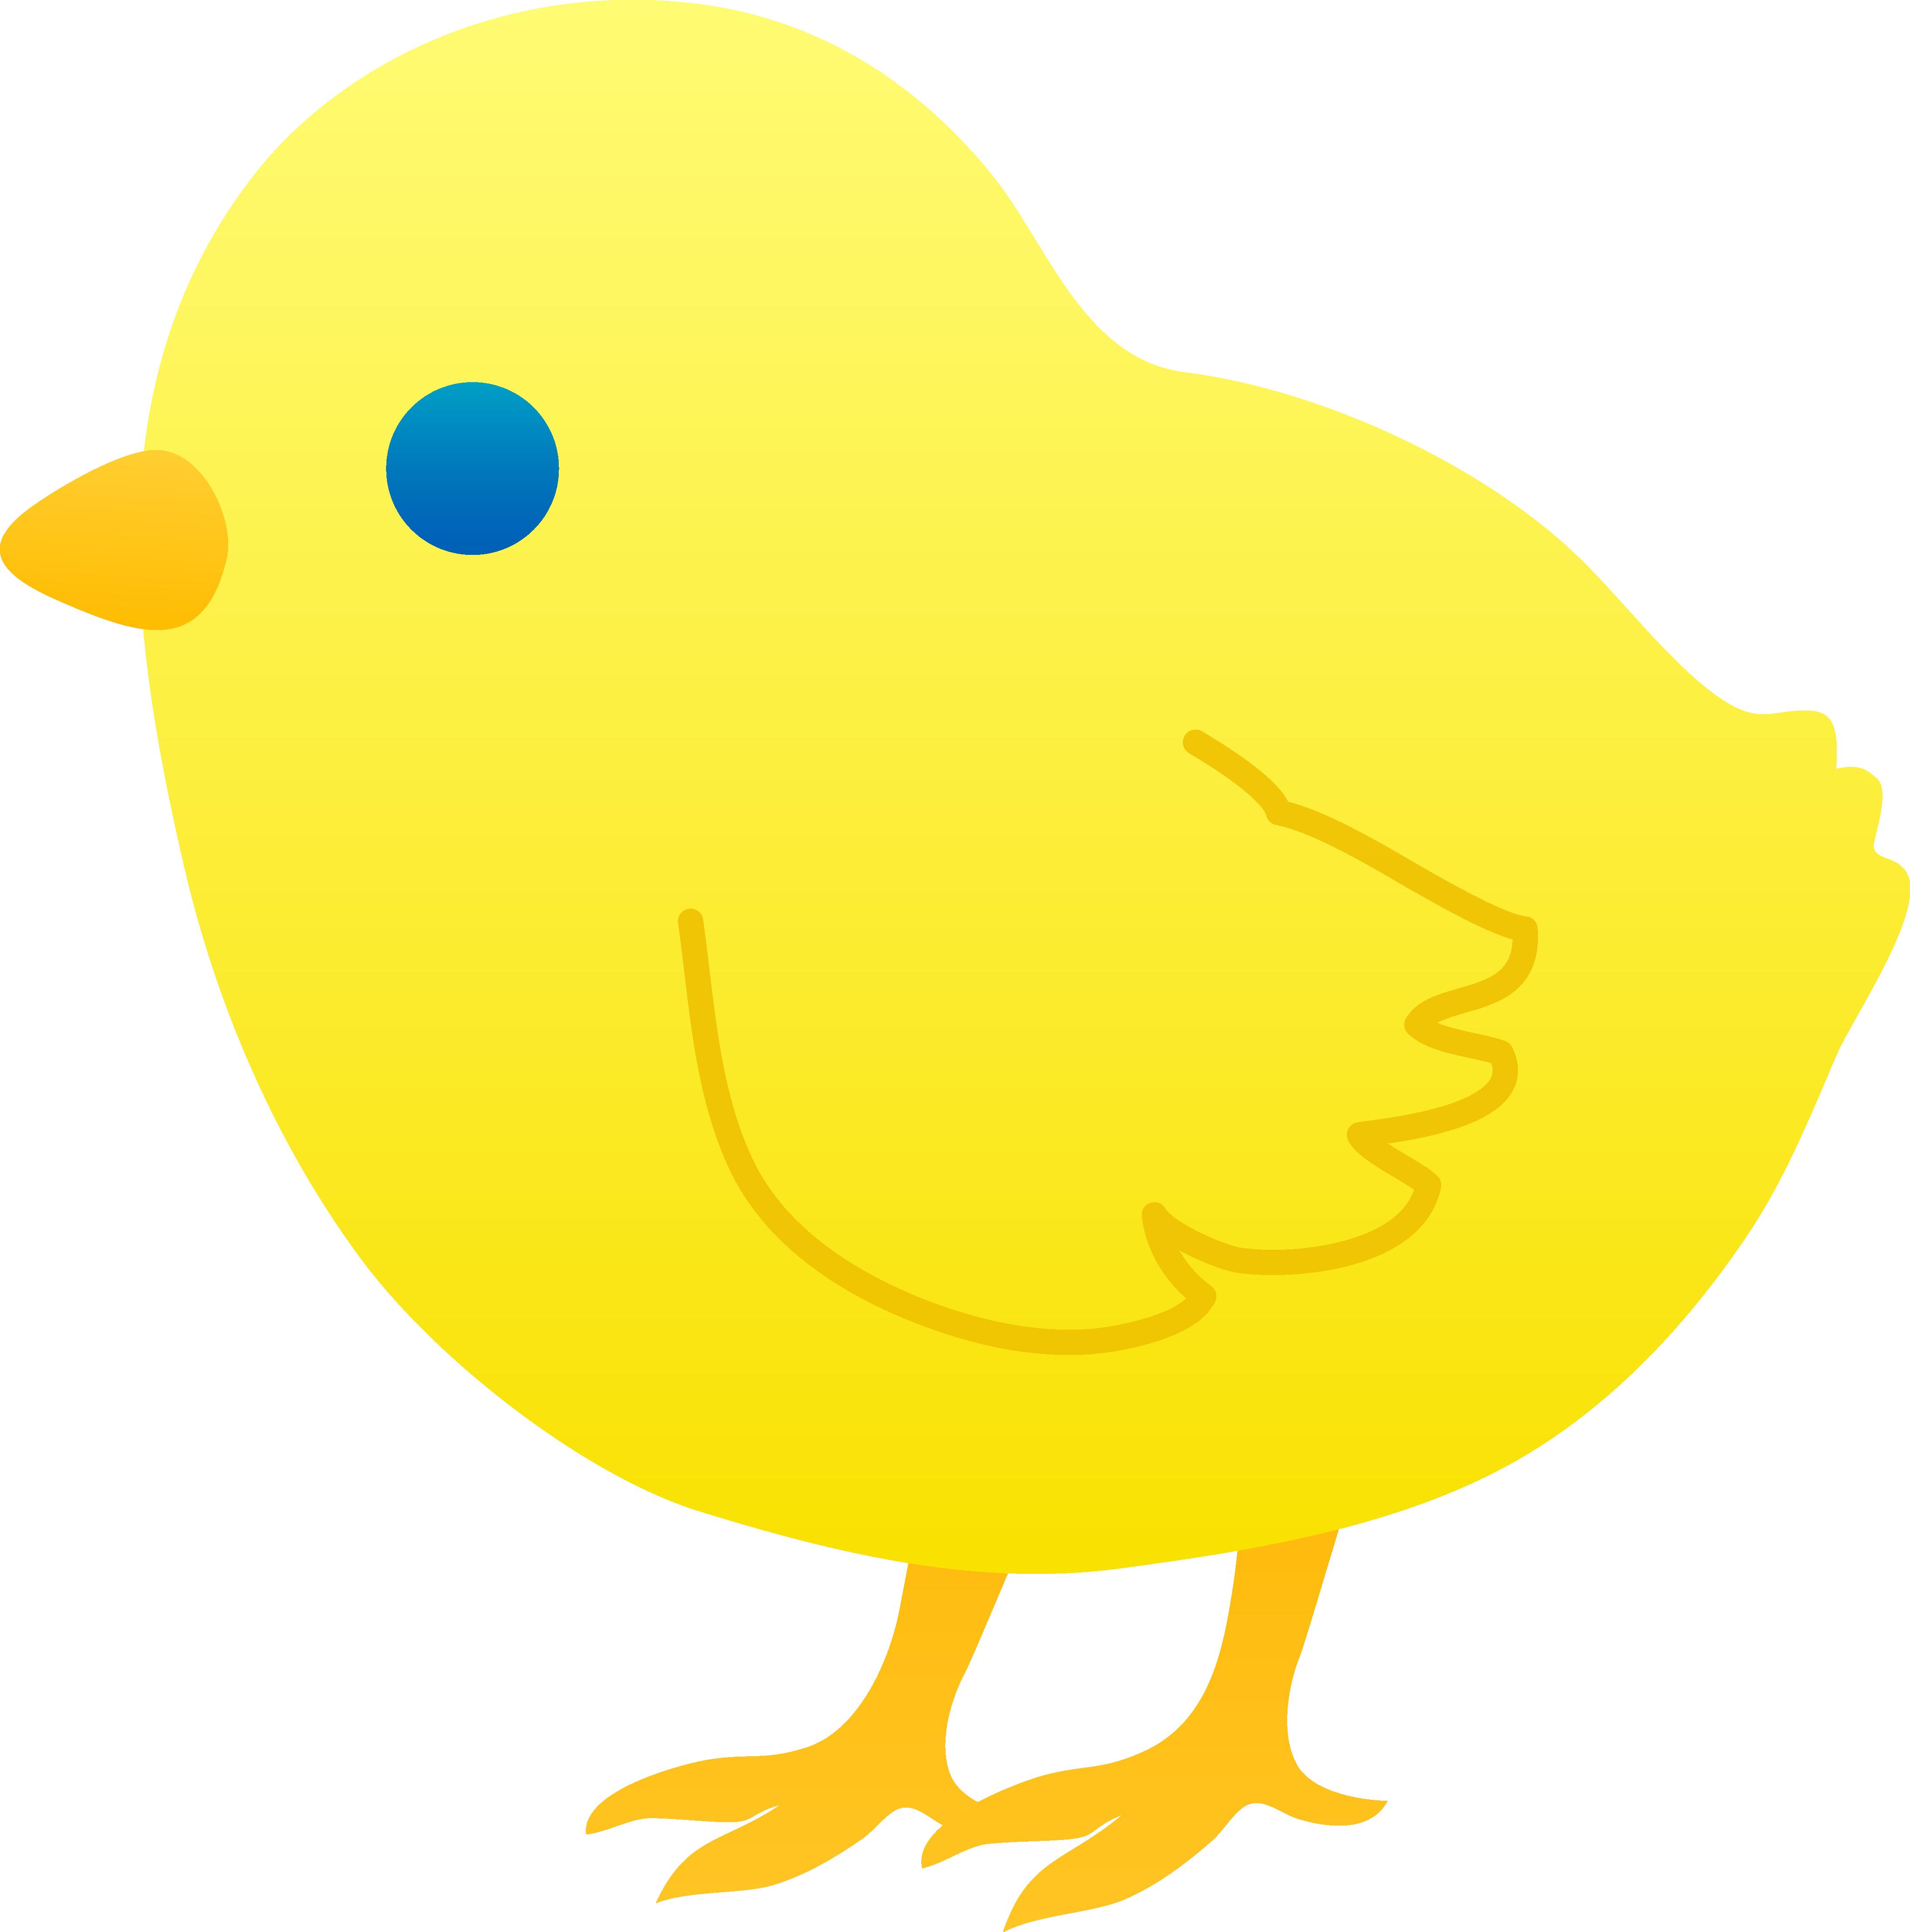 Baby chicken cartoon clipart image royalty free Cute Baby Chick | Chicks | Baby chicks, Baby chickens, Baby cartoon image royalty free